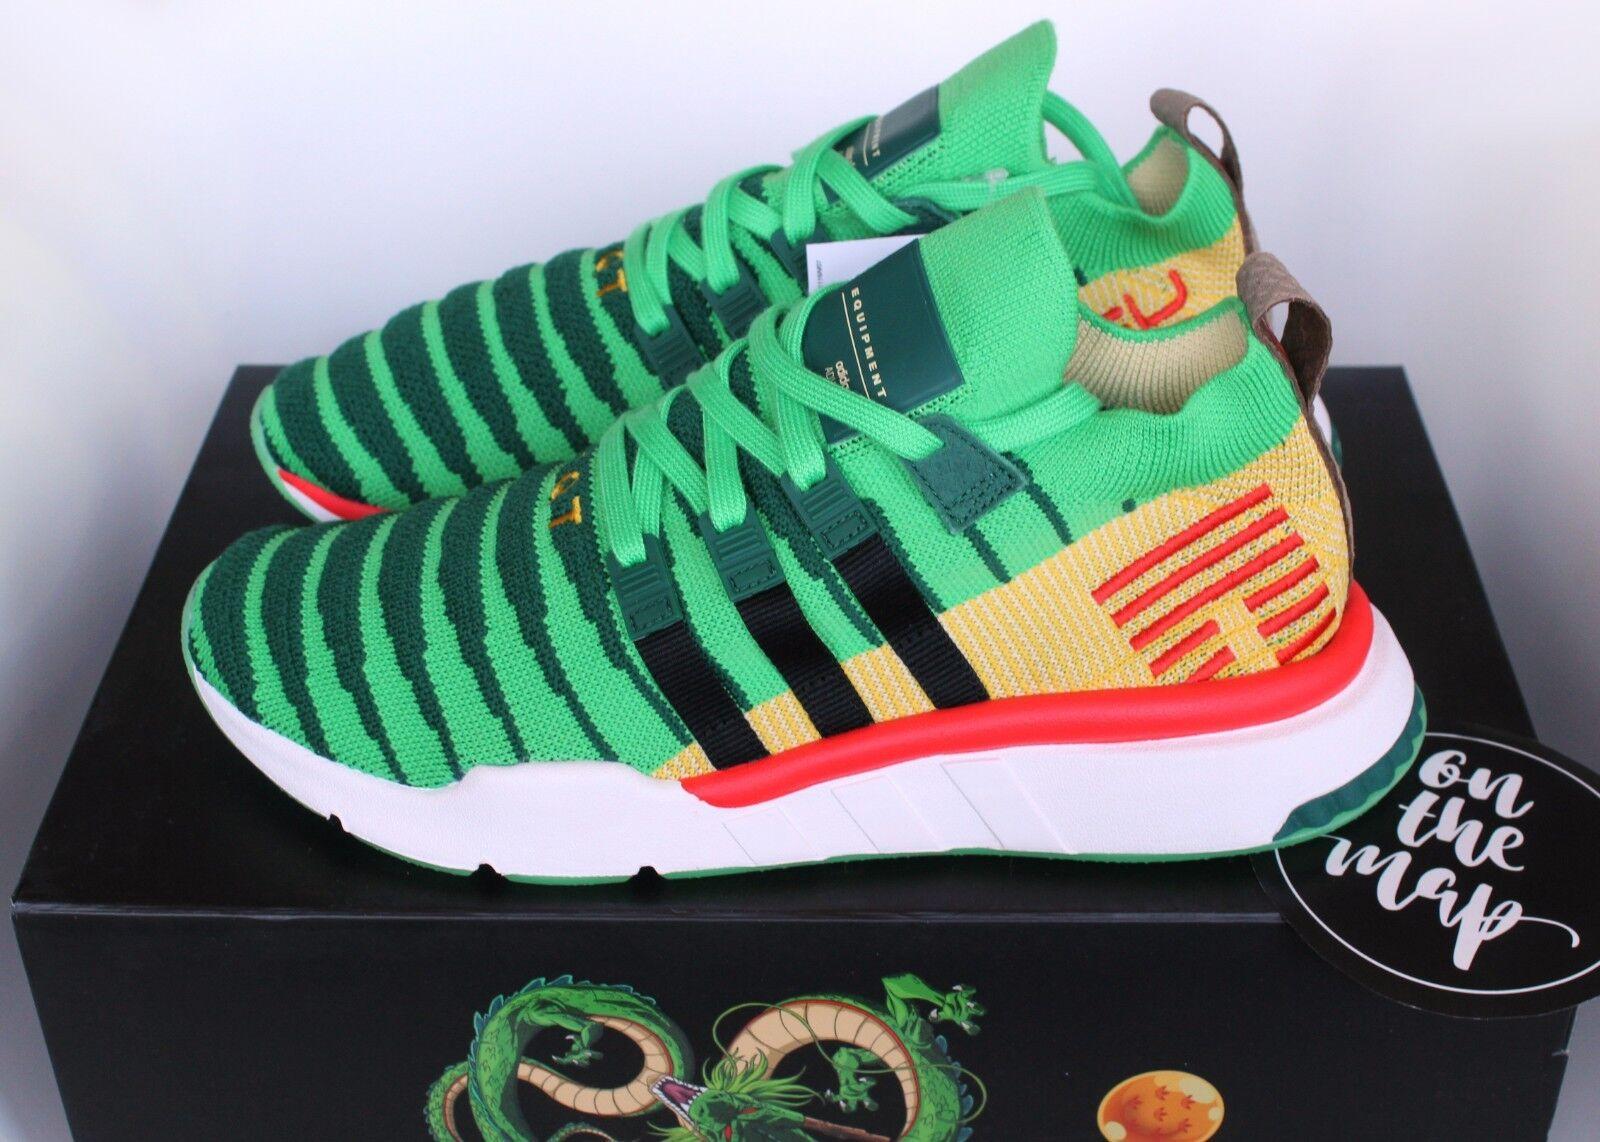 Adidas EQT Support Mid ADV Dragonball DBZ Shenron Green 5 6 7 8 9 10 11 12 13 14